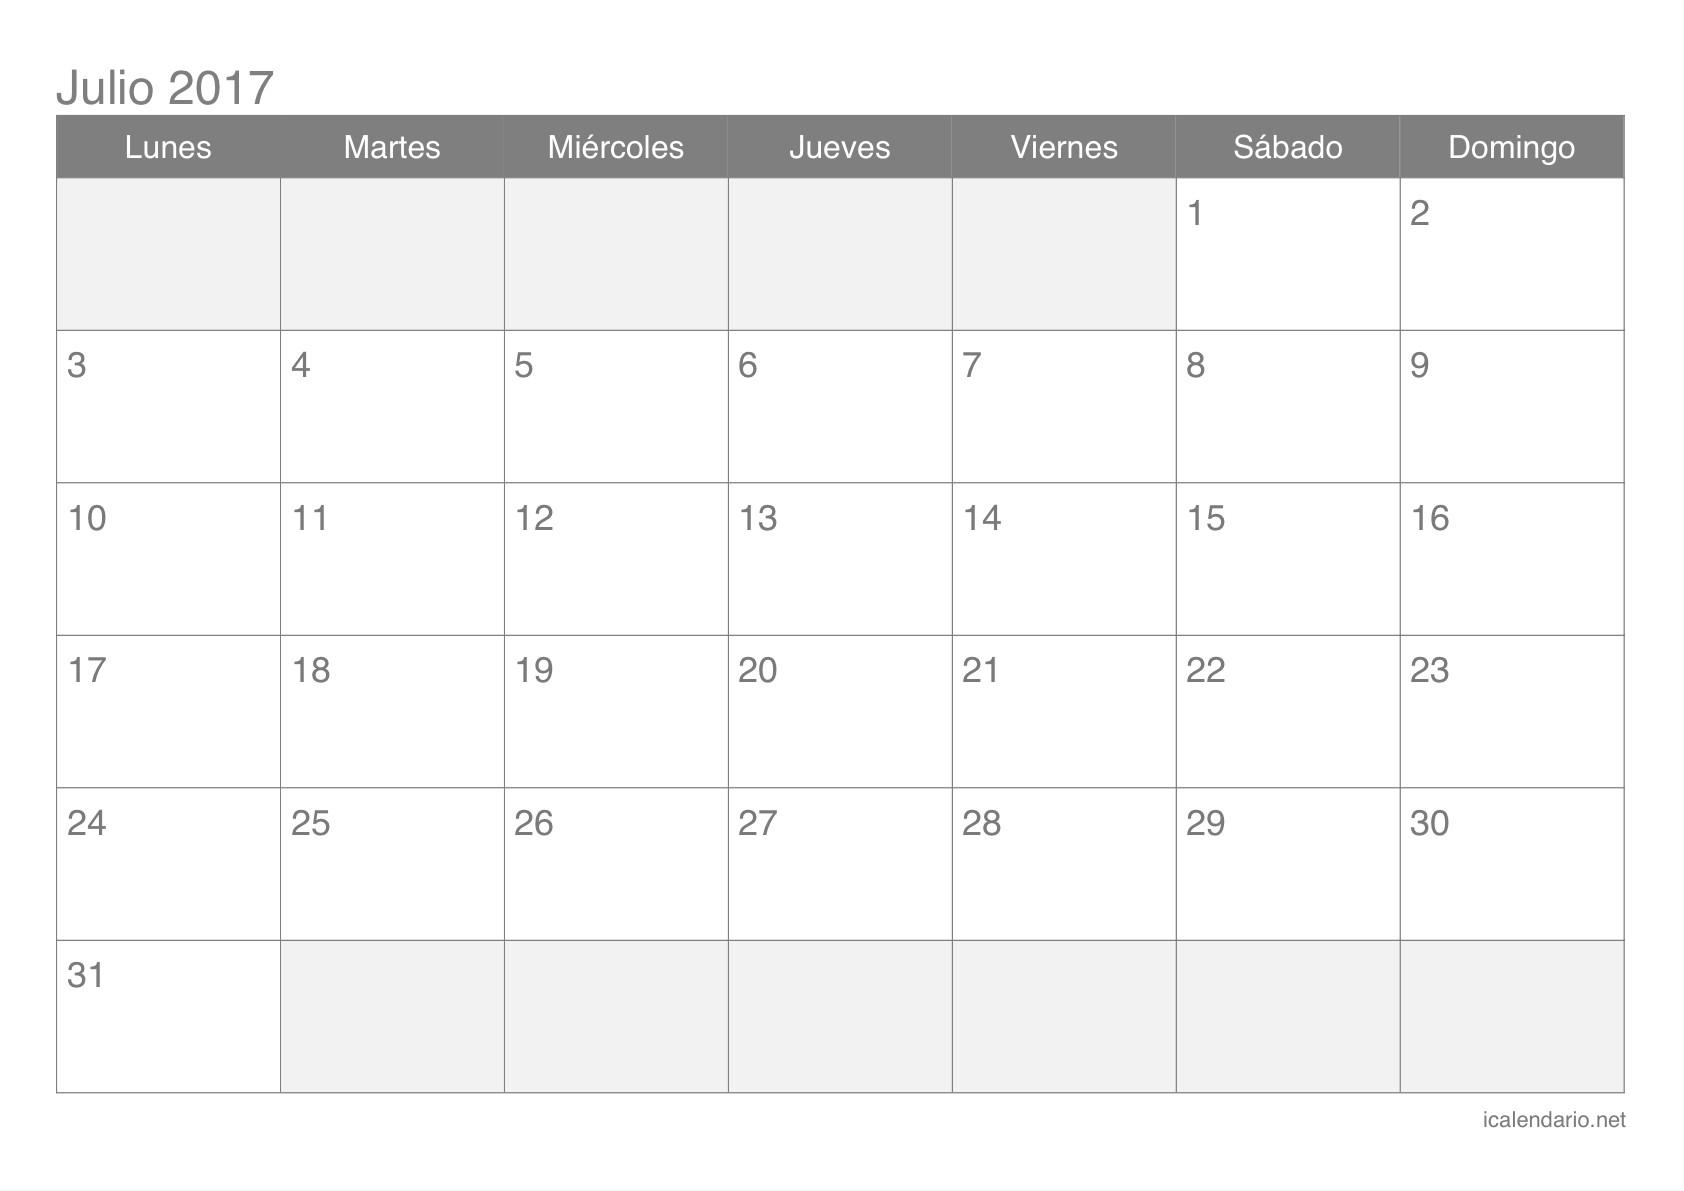 Calendario Janeiro 2020 Brasil Más Recientes Root Of Calendario Janeiro 2020 Brasil Más Recientes Root